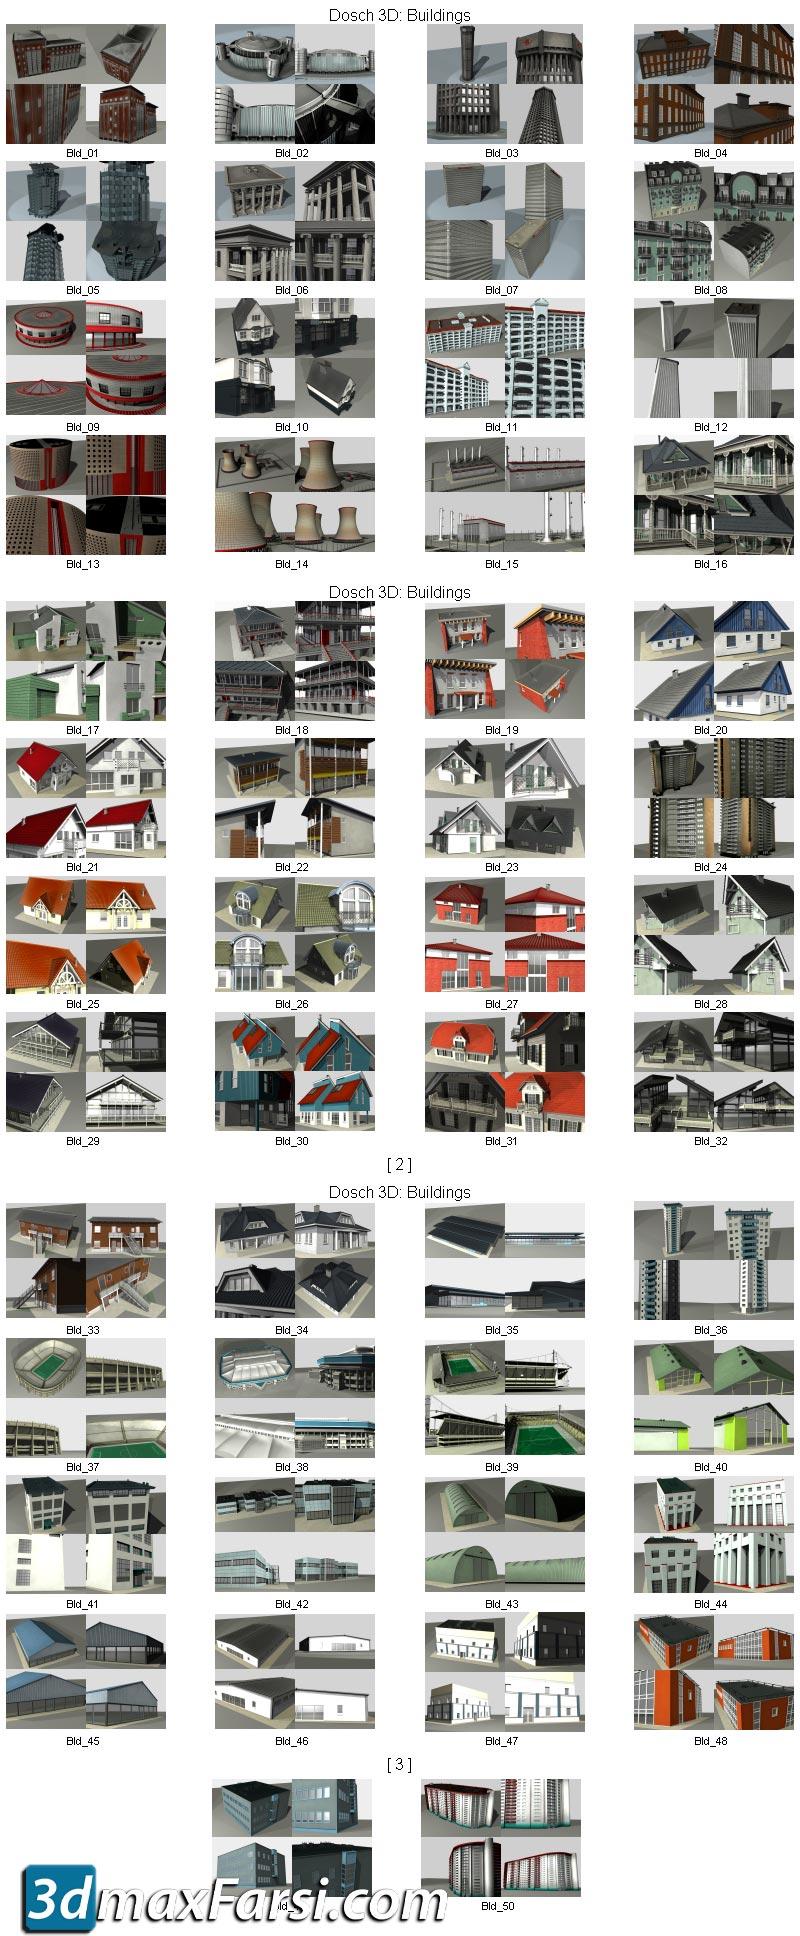 Dosch_3D Buildings 3DS download